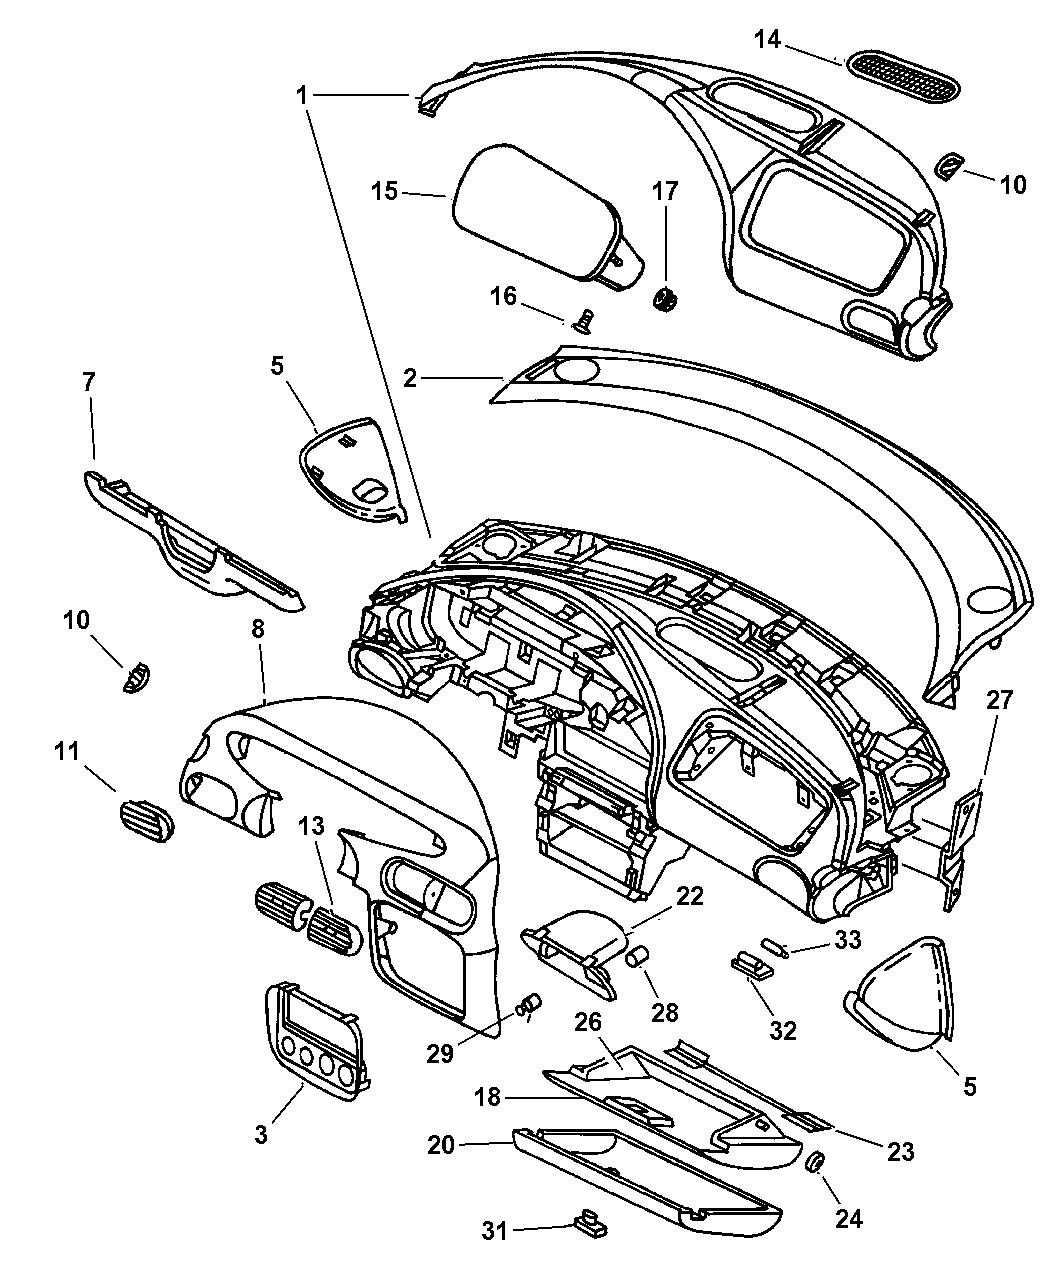 2000 Chrysler Cirrus Instrument Panel